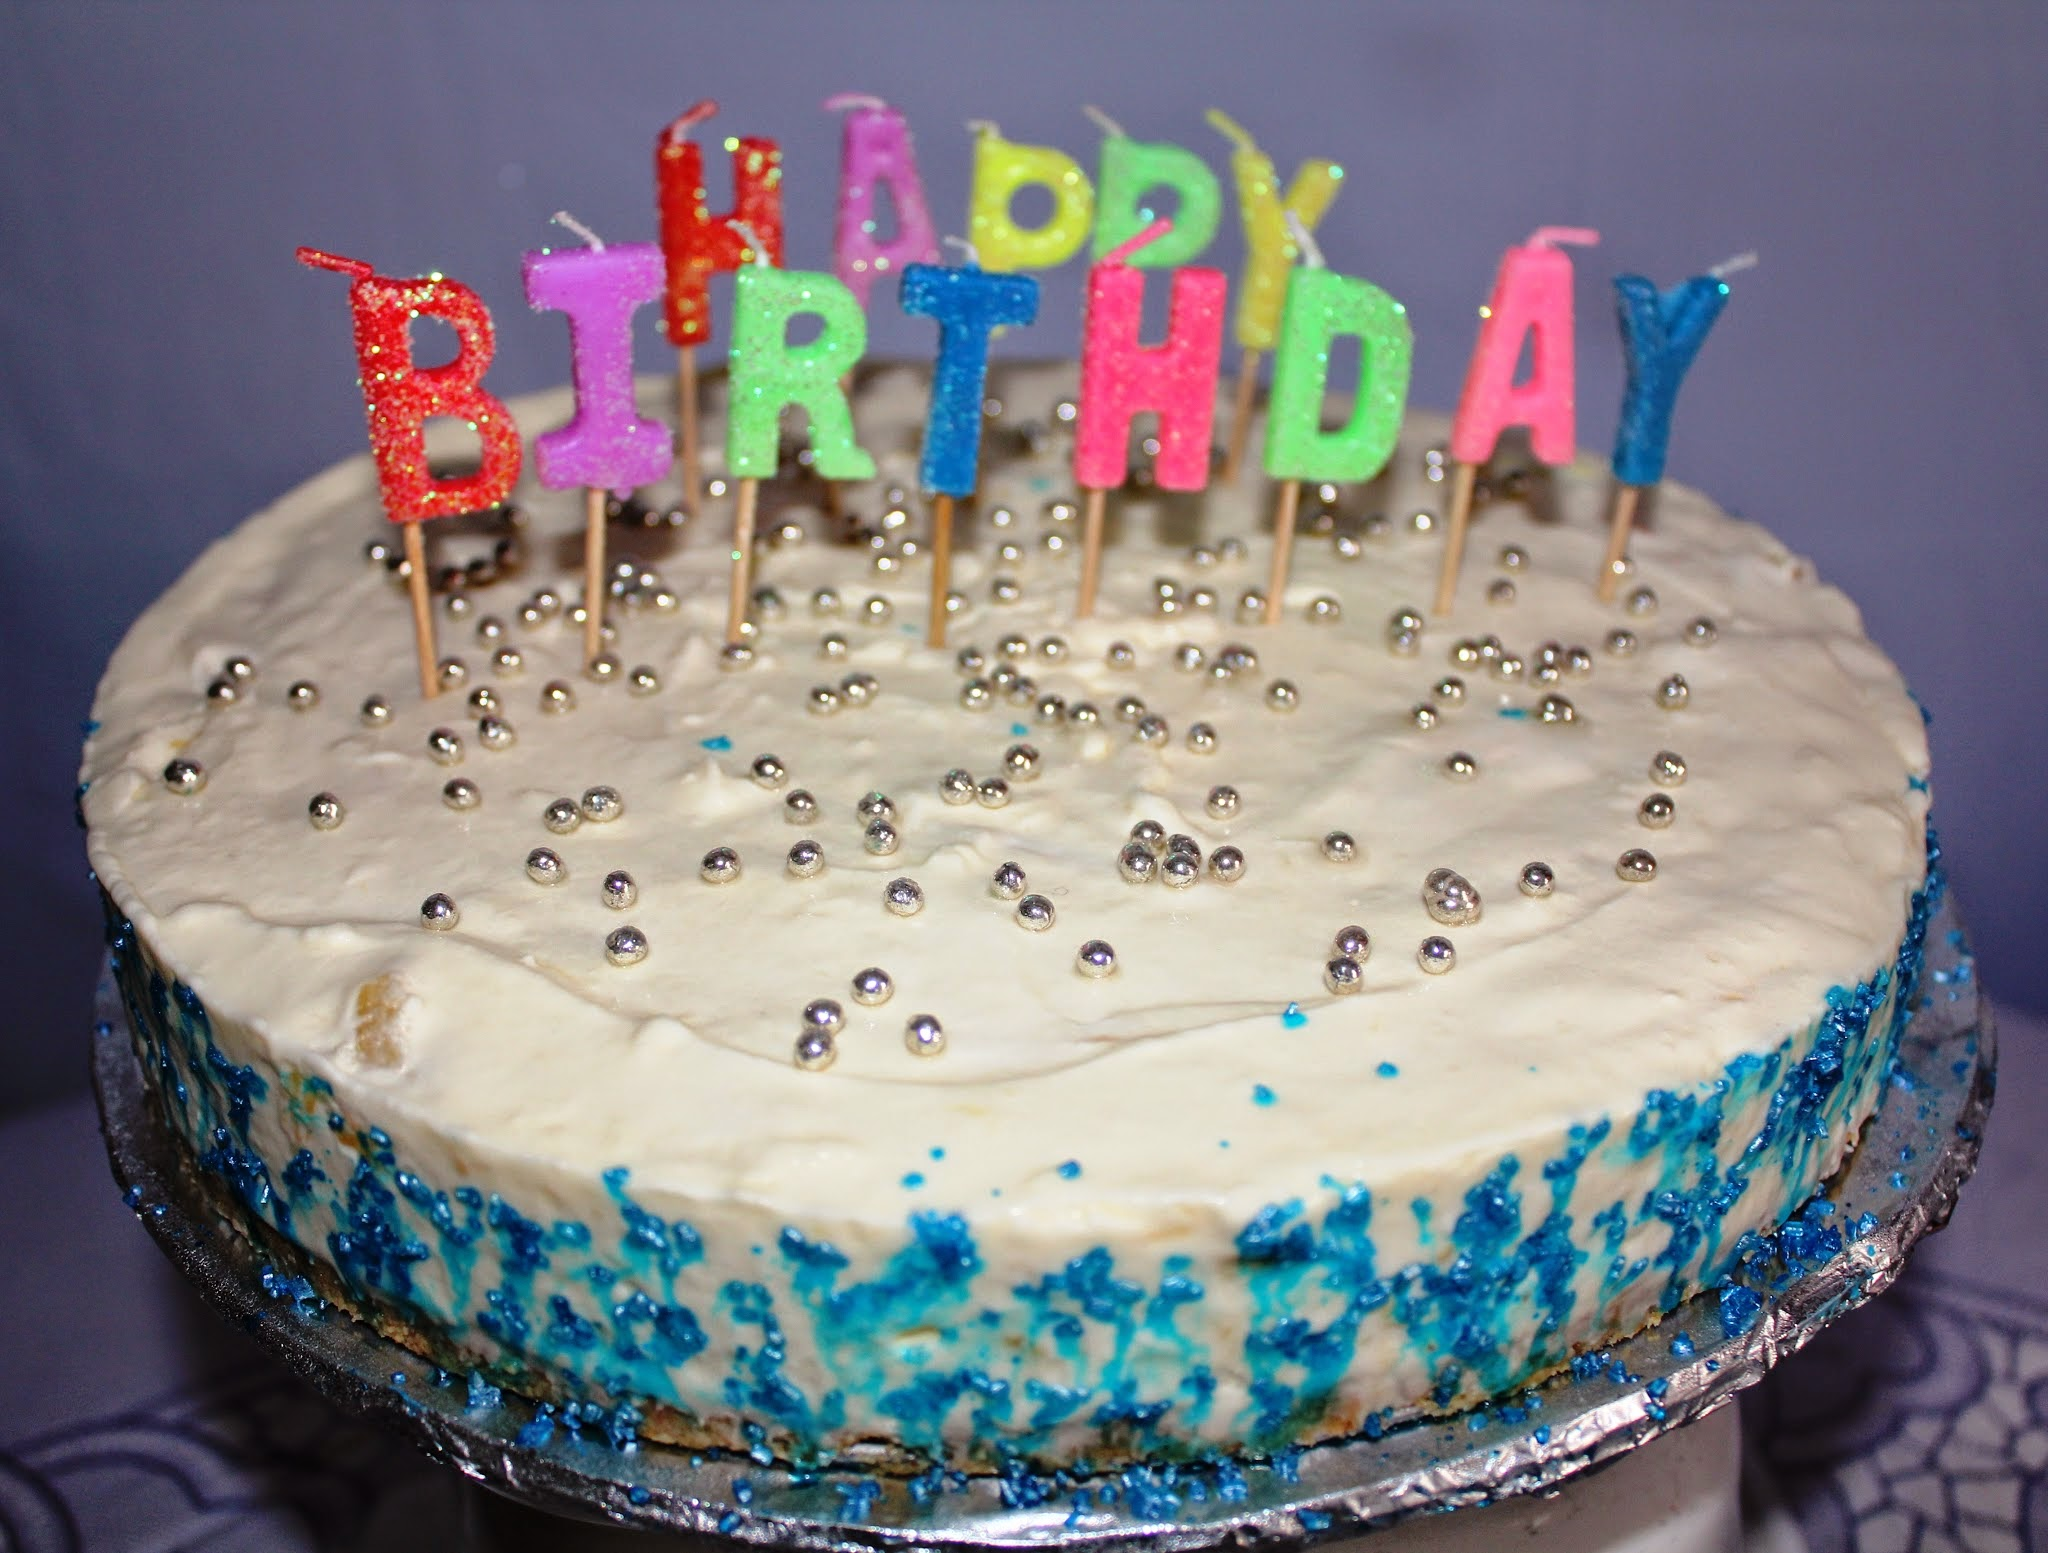 Cakes, Cheesecakes, Frozen, frozen birthday, Frozen Cheesecake, recipe, hawaiian cheesecake, simple chill cheesecake recipe,